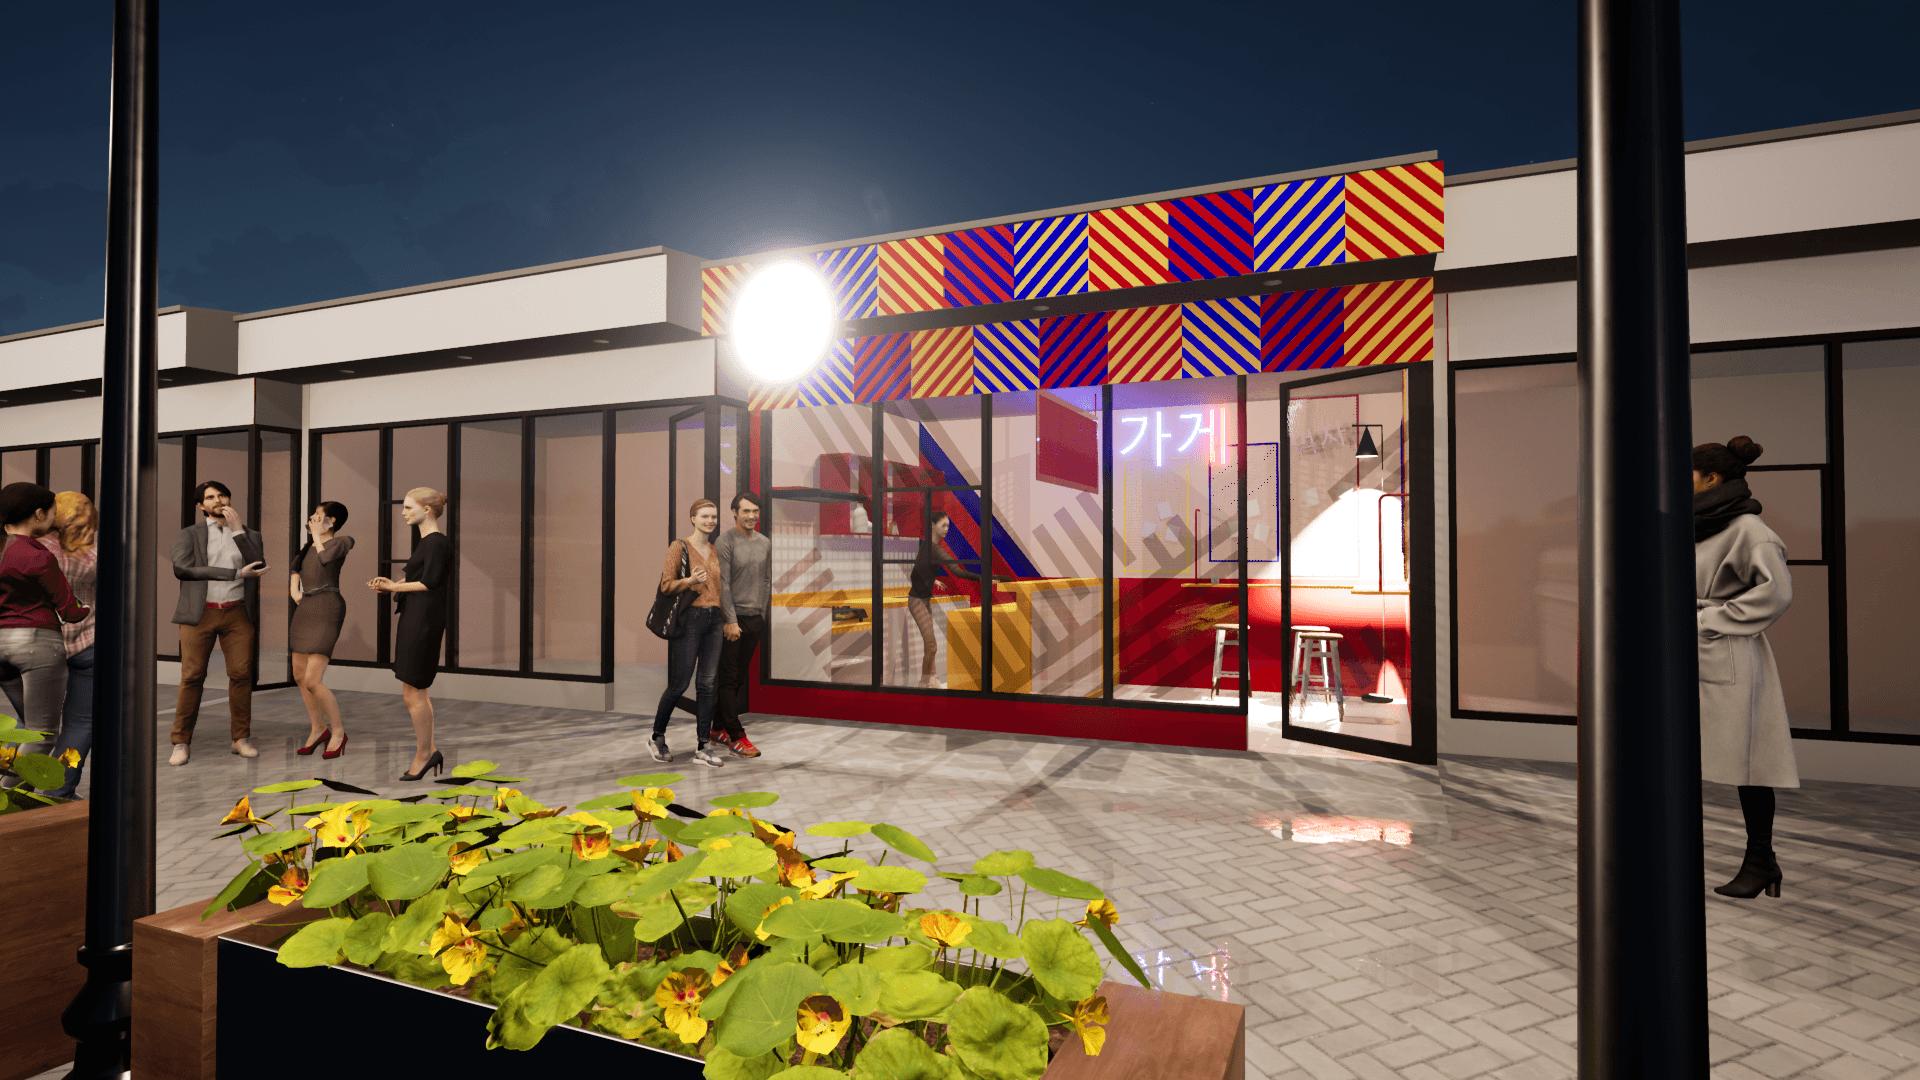 Arsiyasta Studio Korean Food Stall - Kedai Makanan Korea Surabaya, Kota Sby, Jawa Timur, Indonesia Surabaya, Kota Sby, Jawa Timur, Indonesia Arsiyasta-Studio-Korean-Food-Stall-Kedai-Makanan-Korea  115867